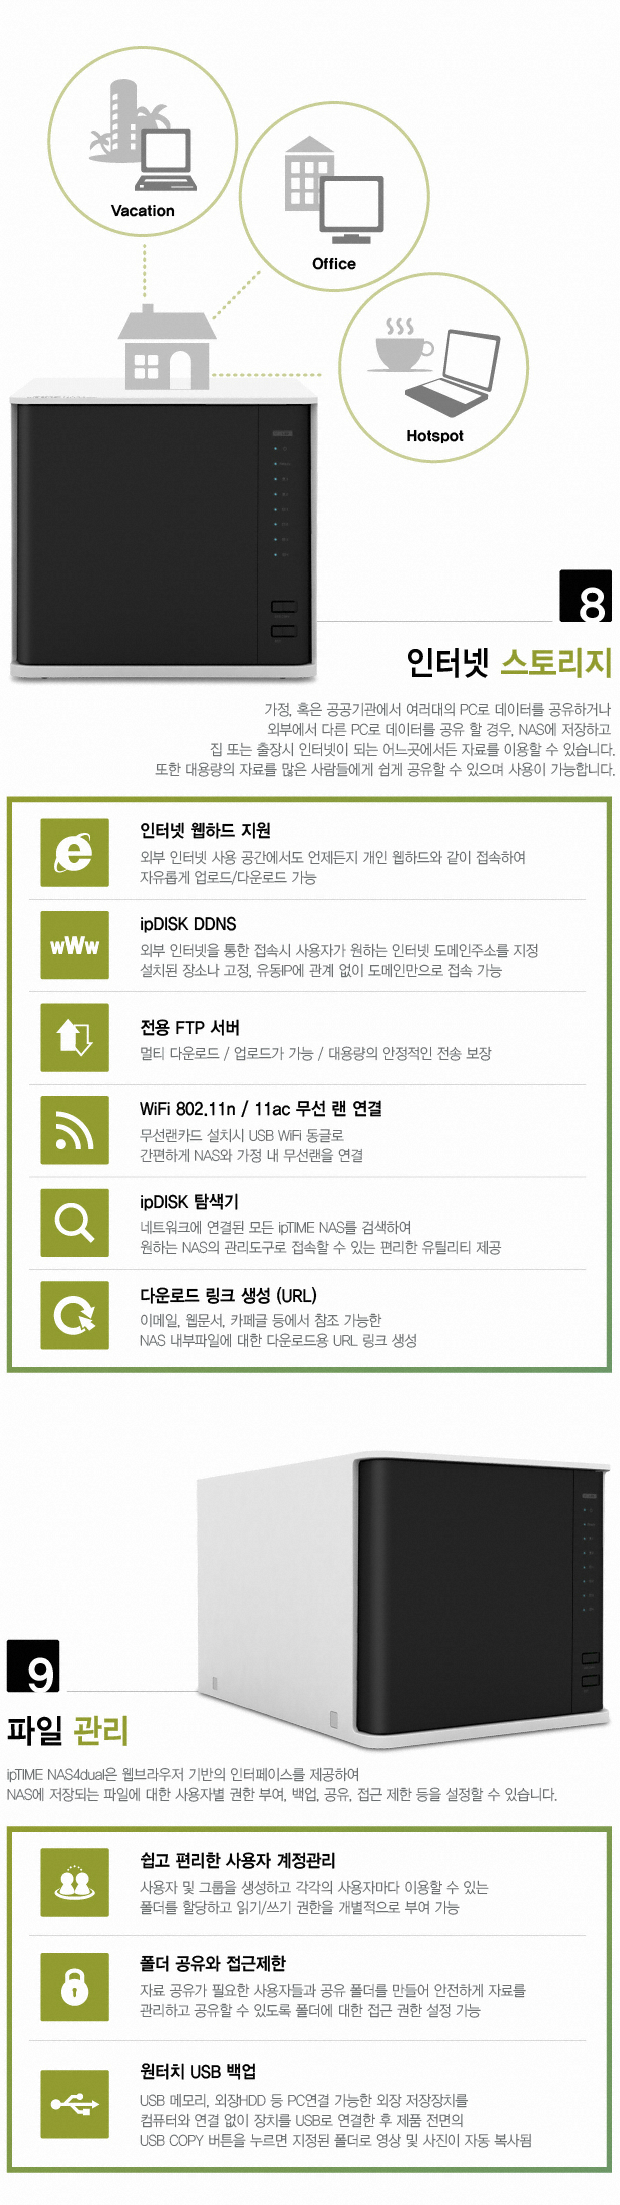 EFM ipTIME NAS4dual (48TB)